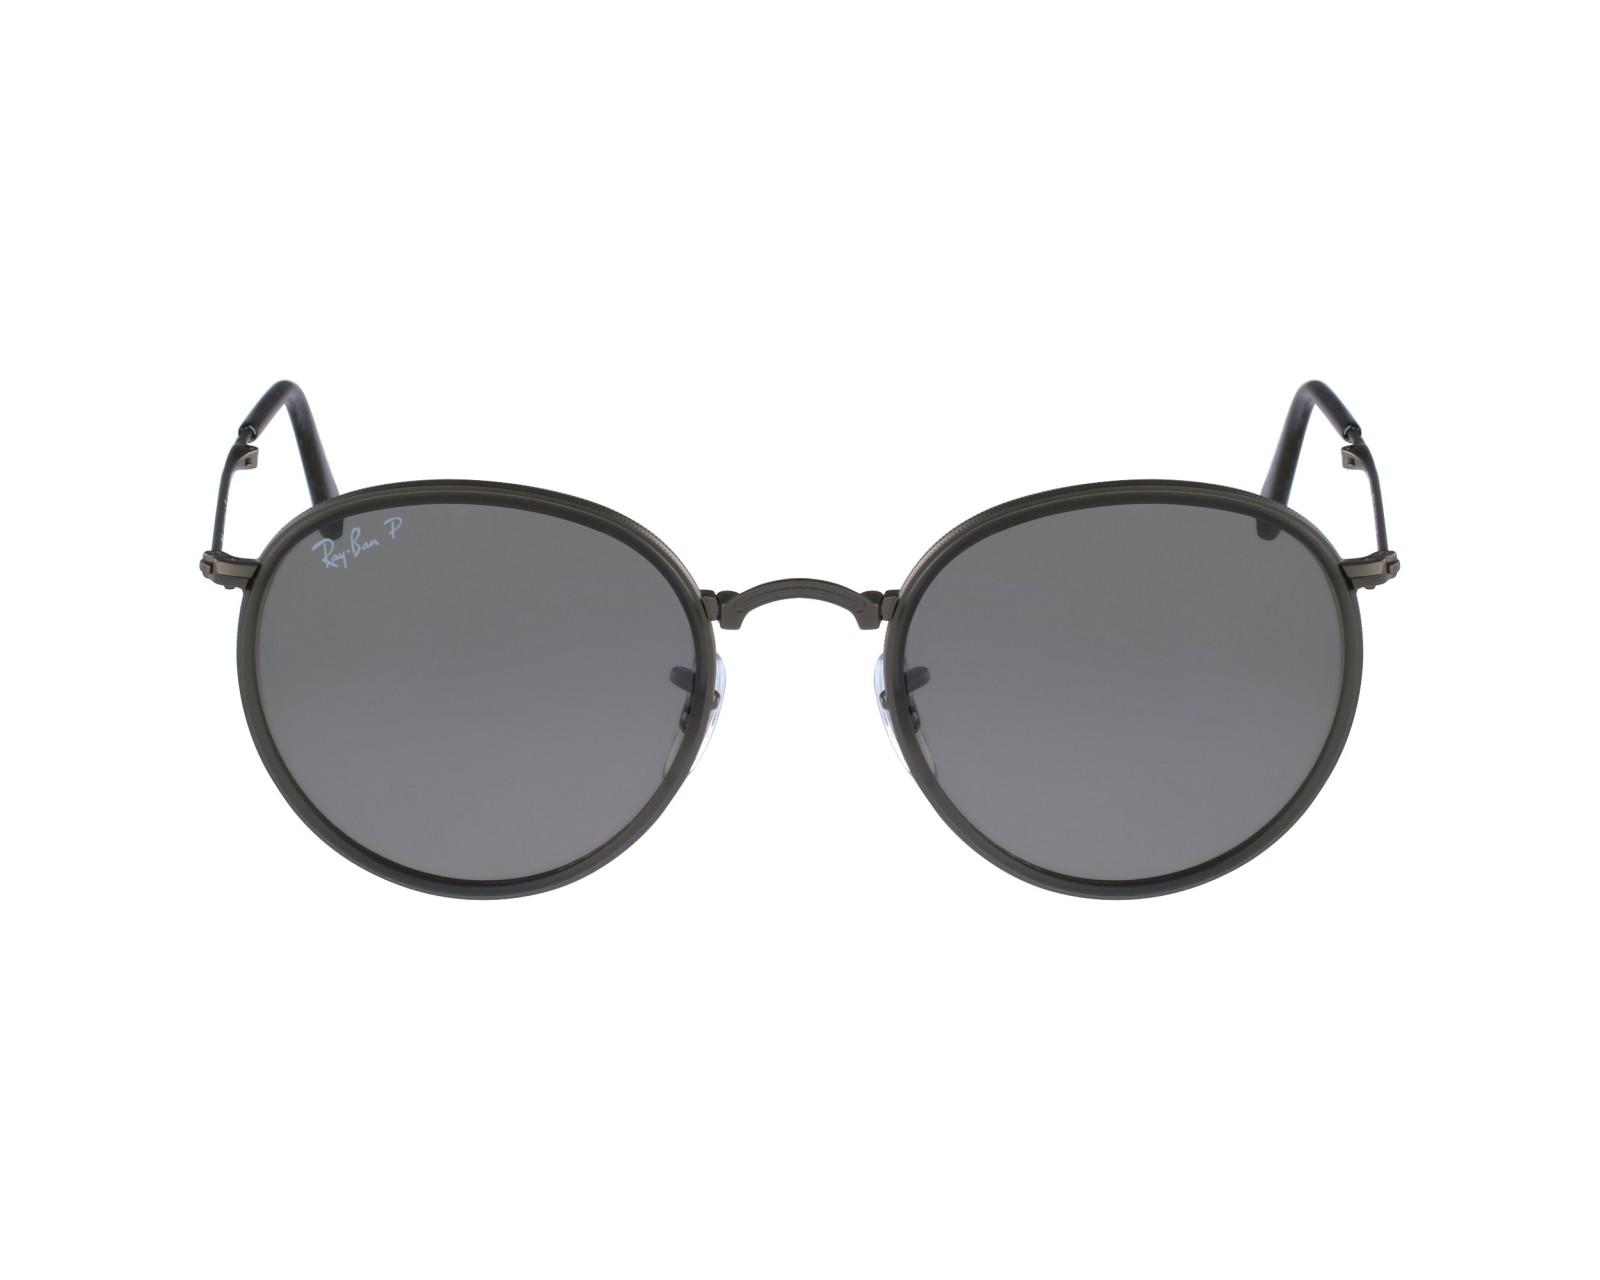 Ray-Ban Sunglasses RB-3517 029/N8 Gun with Black